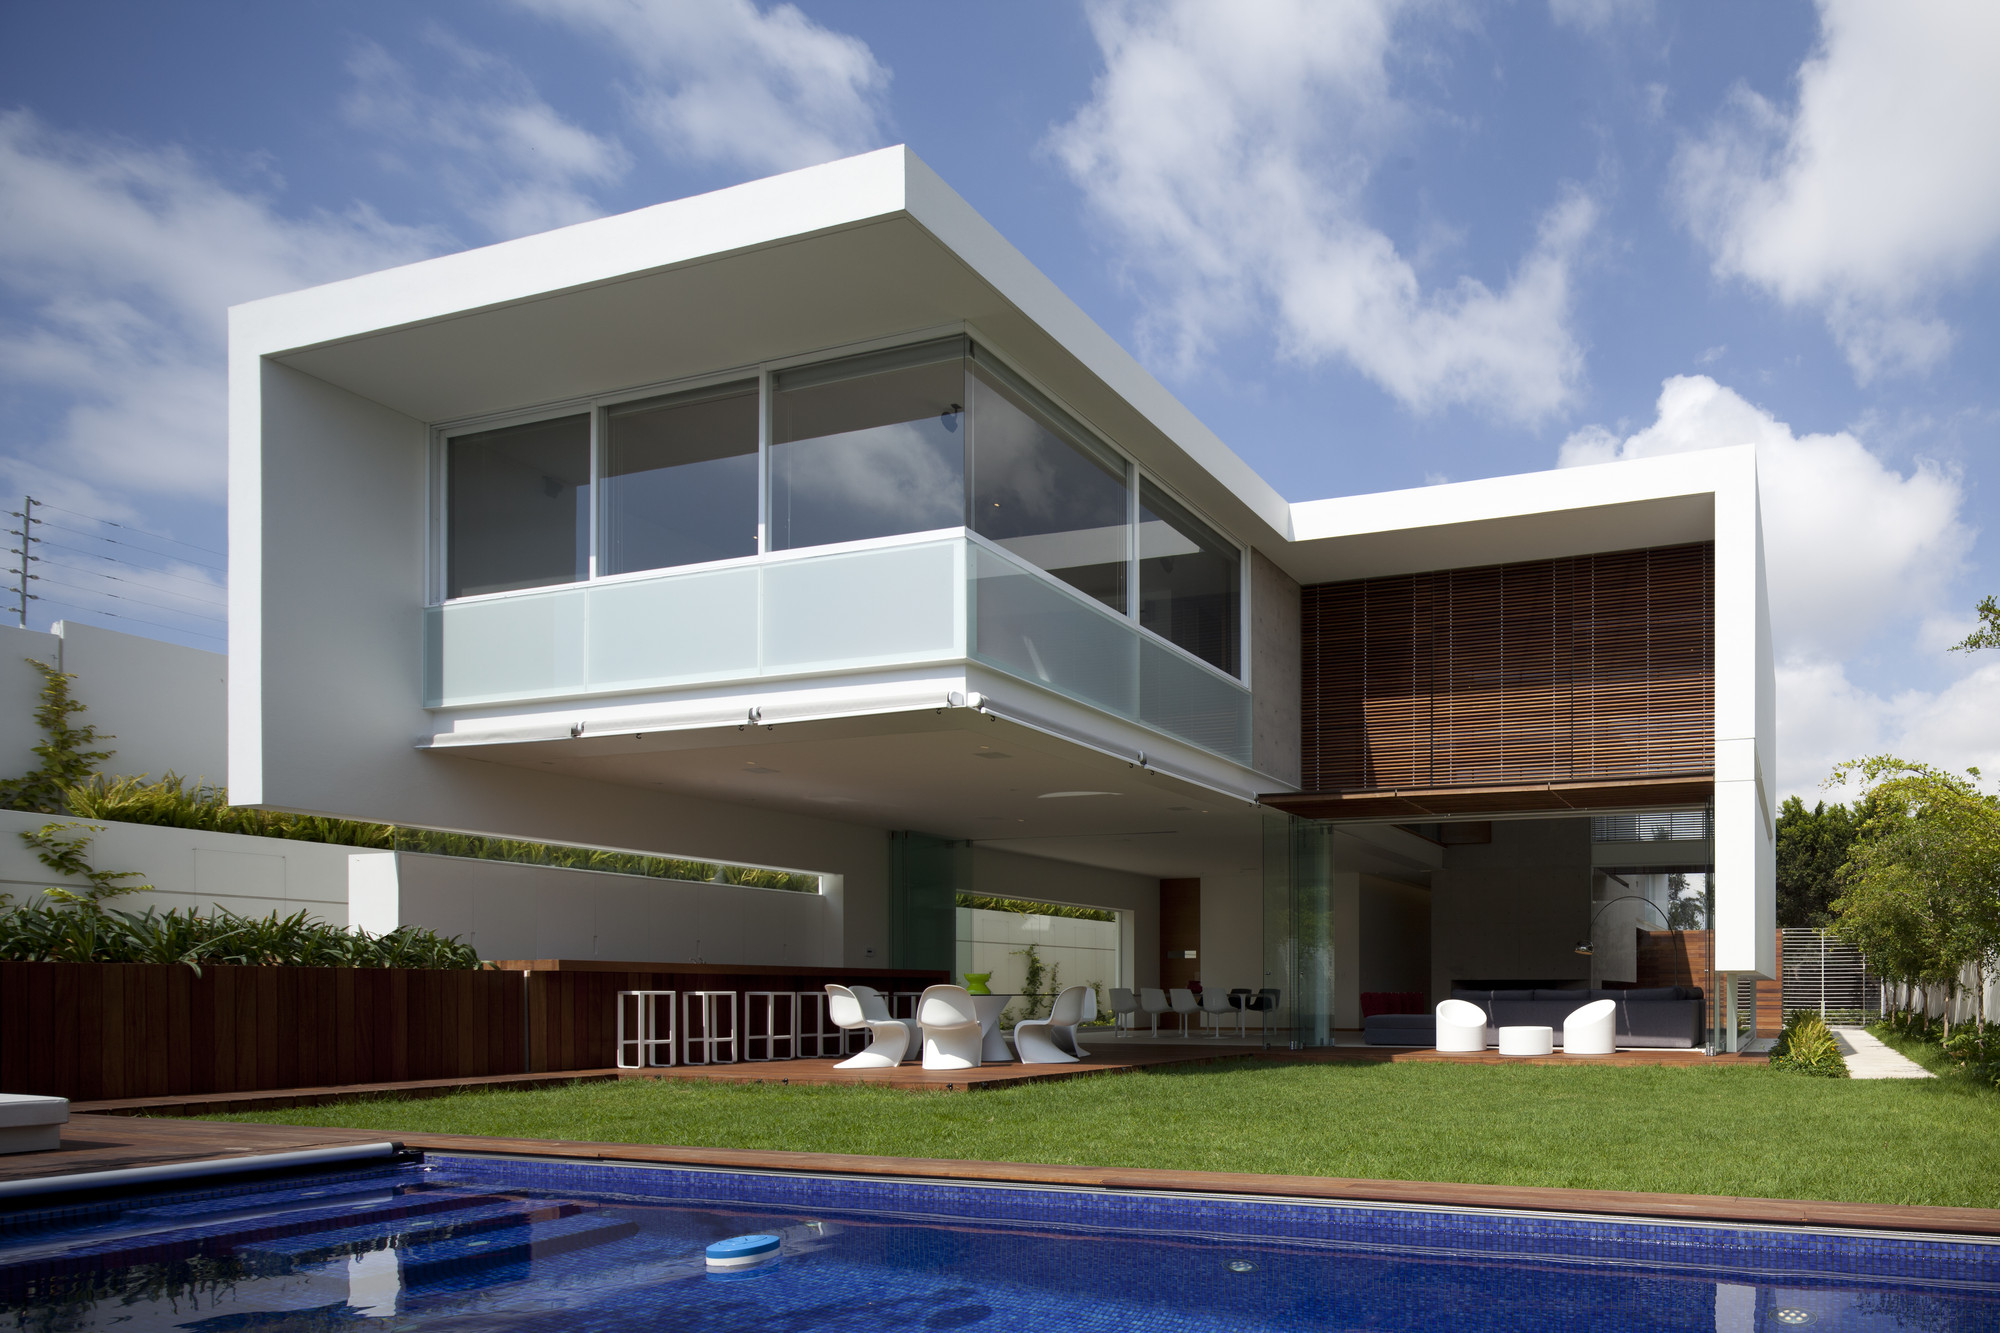 Ff house hernandez silva arquitectos archdaily for Piani di house designer casa